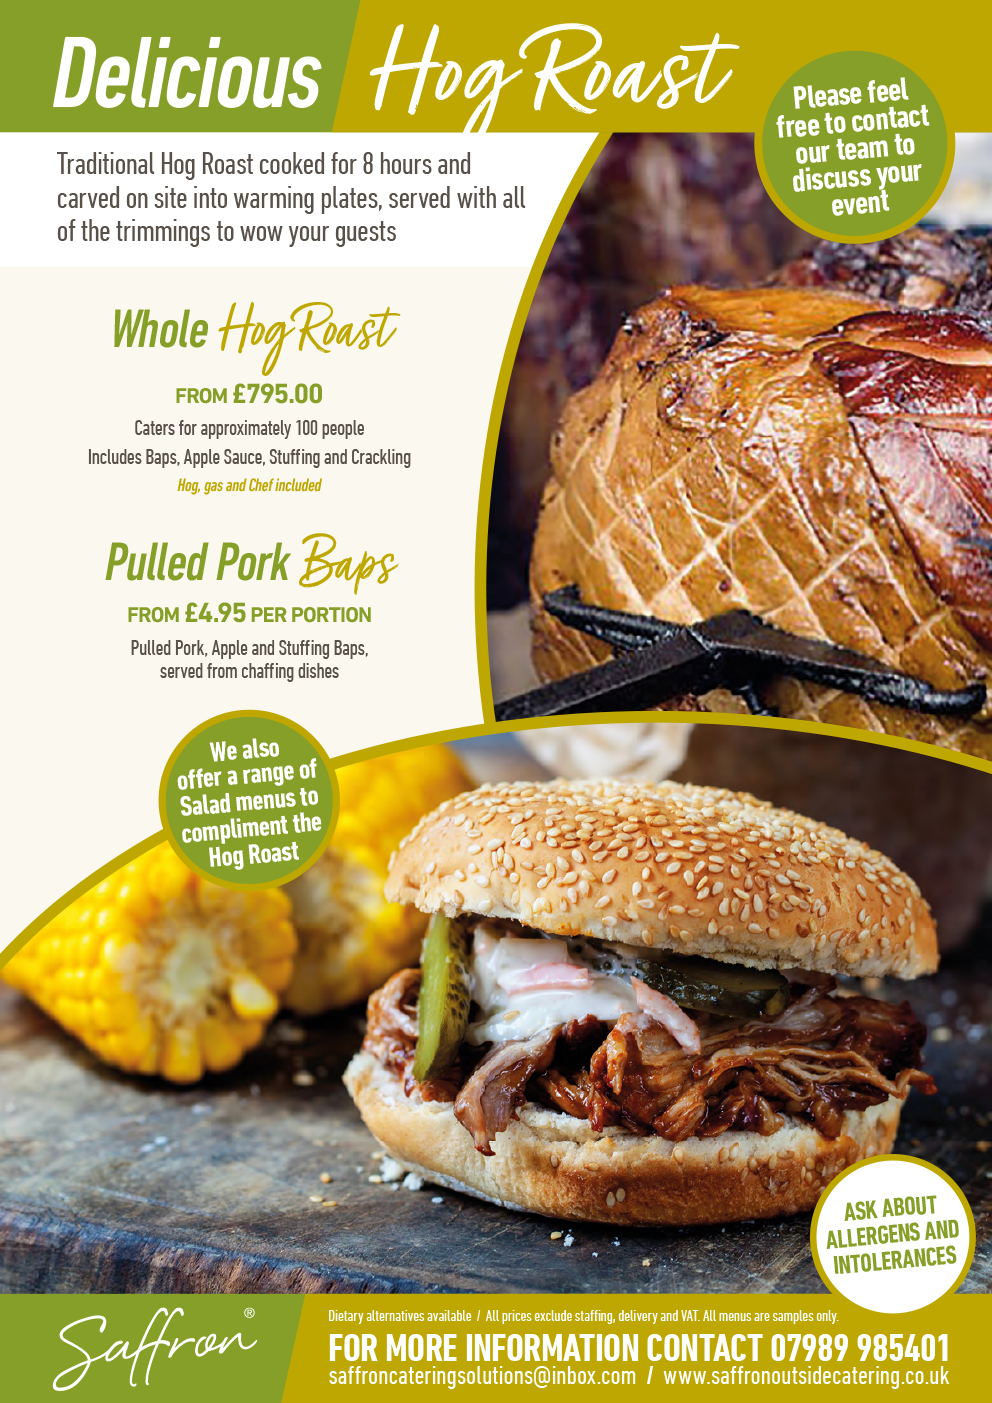 Saffron Menu Hog Roast - Hog Roast Menu